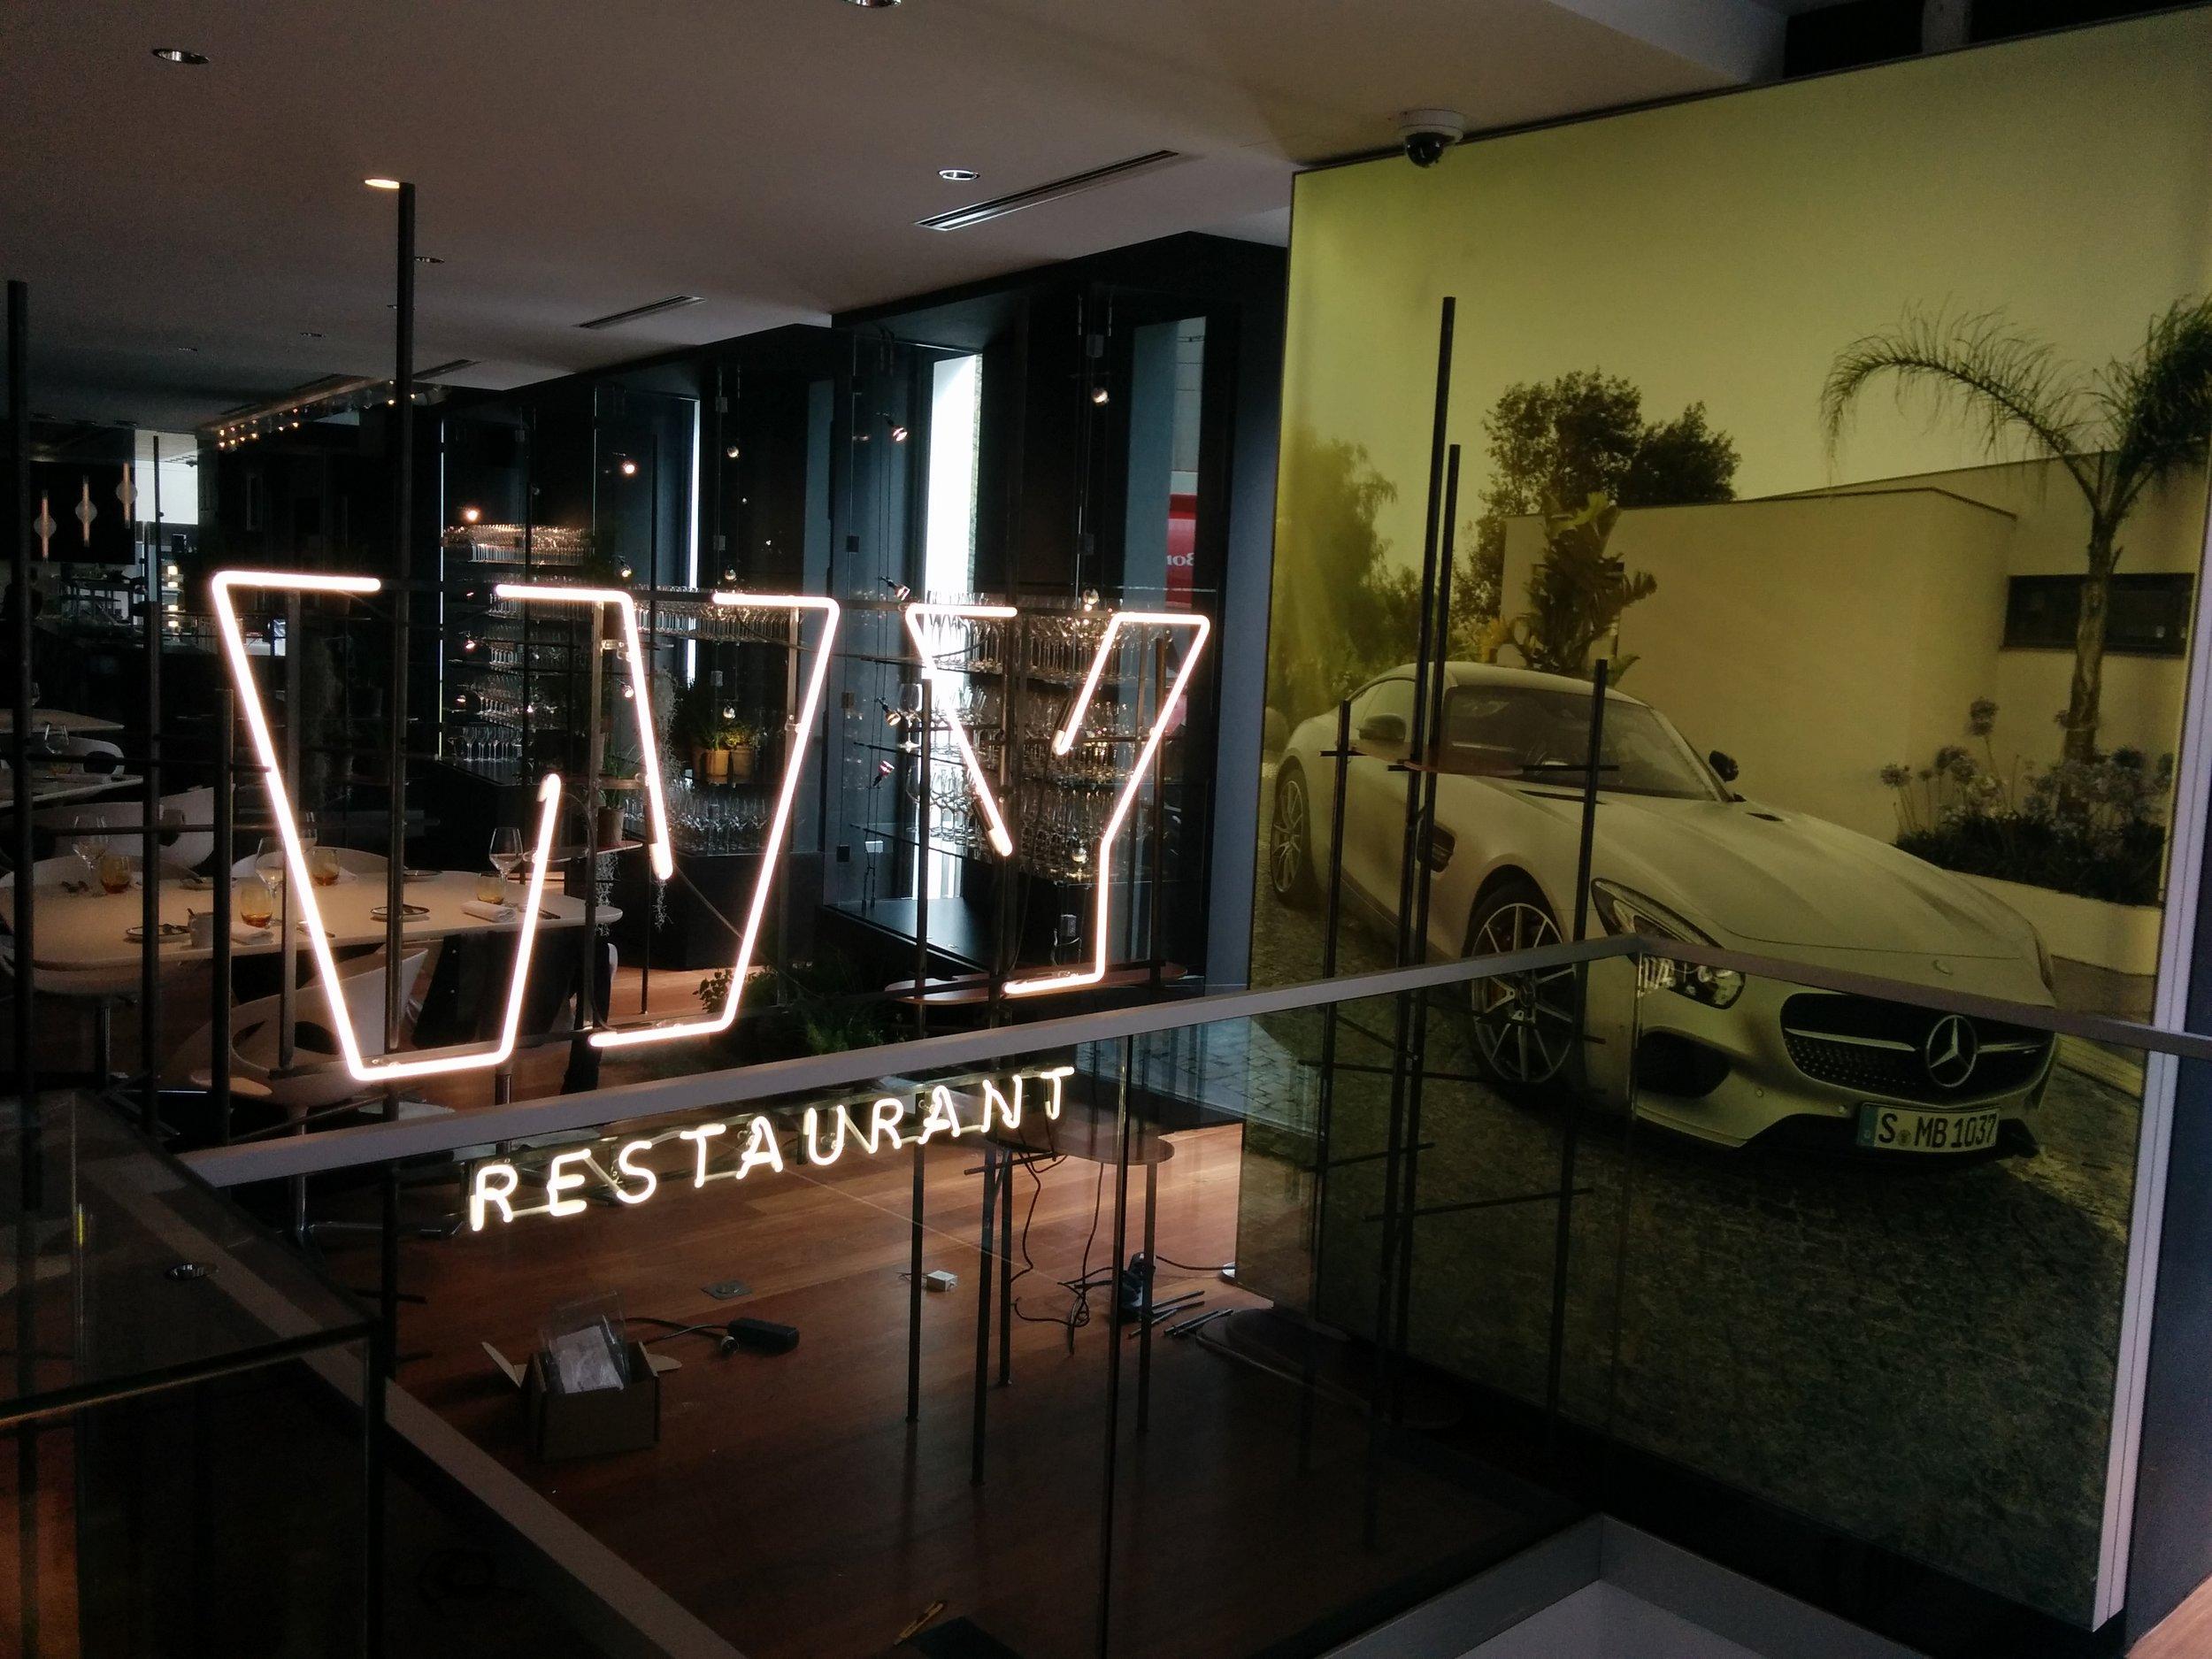 Neonreclame WY Restaurant